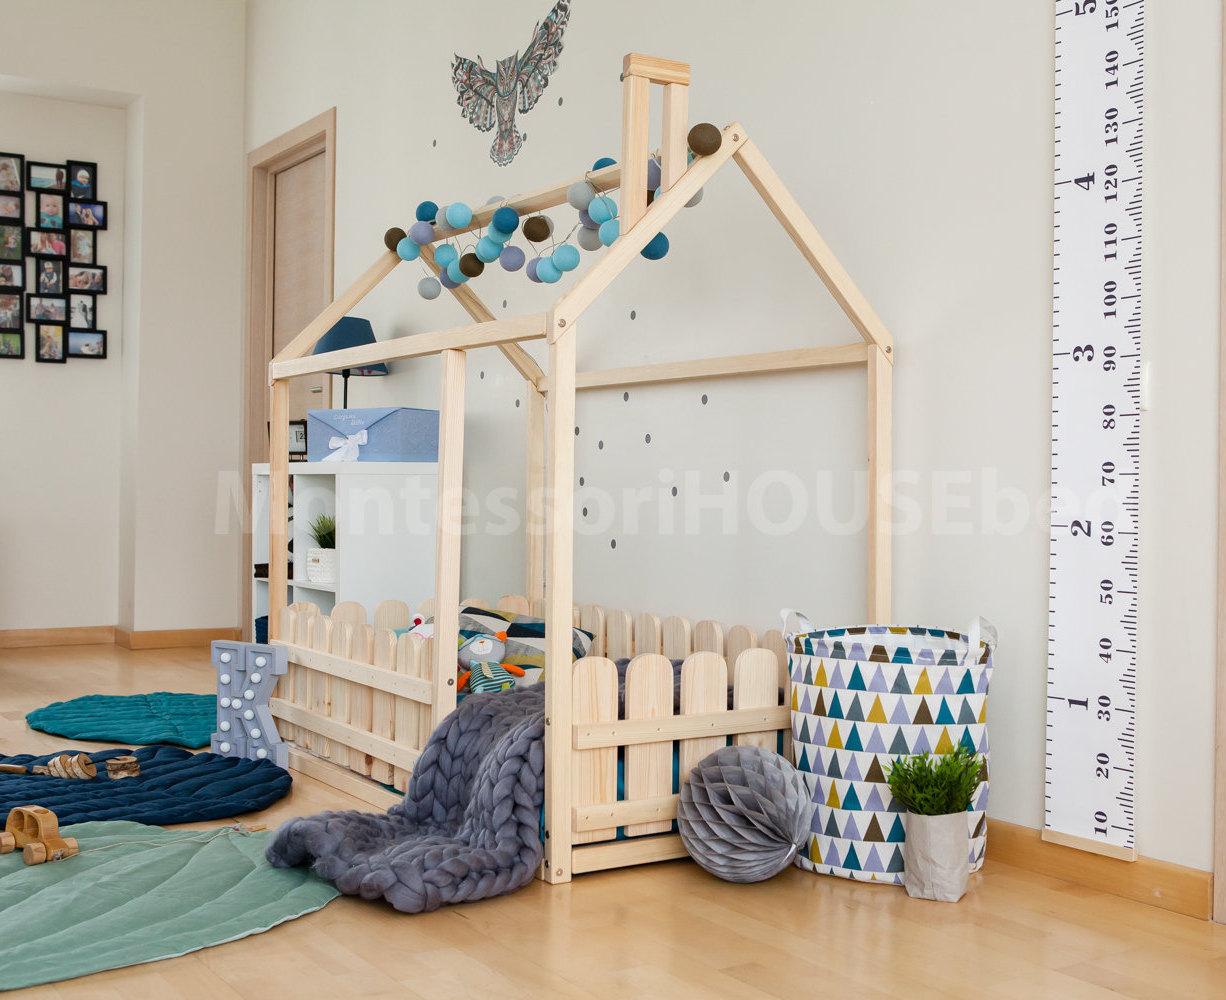 Krippe Boden Haus Bett Kinderbett Holzhaus Rahmen Bett | Etsy